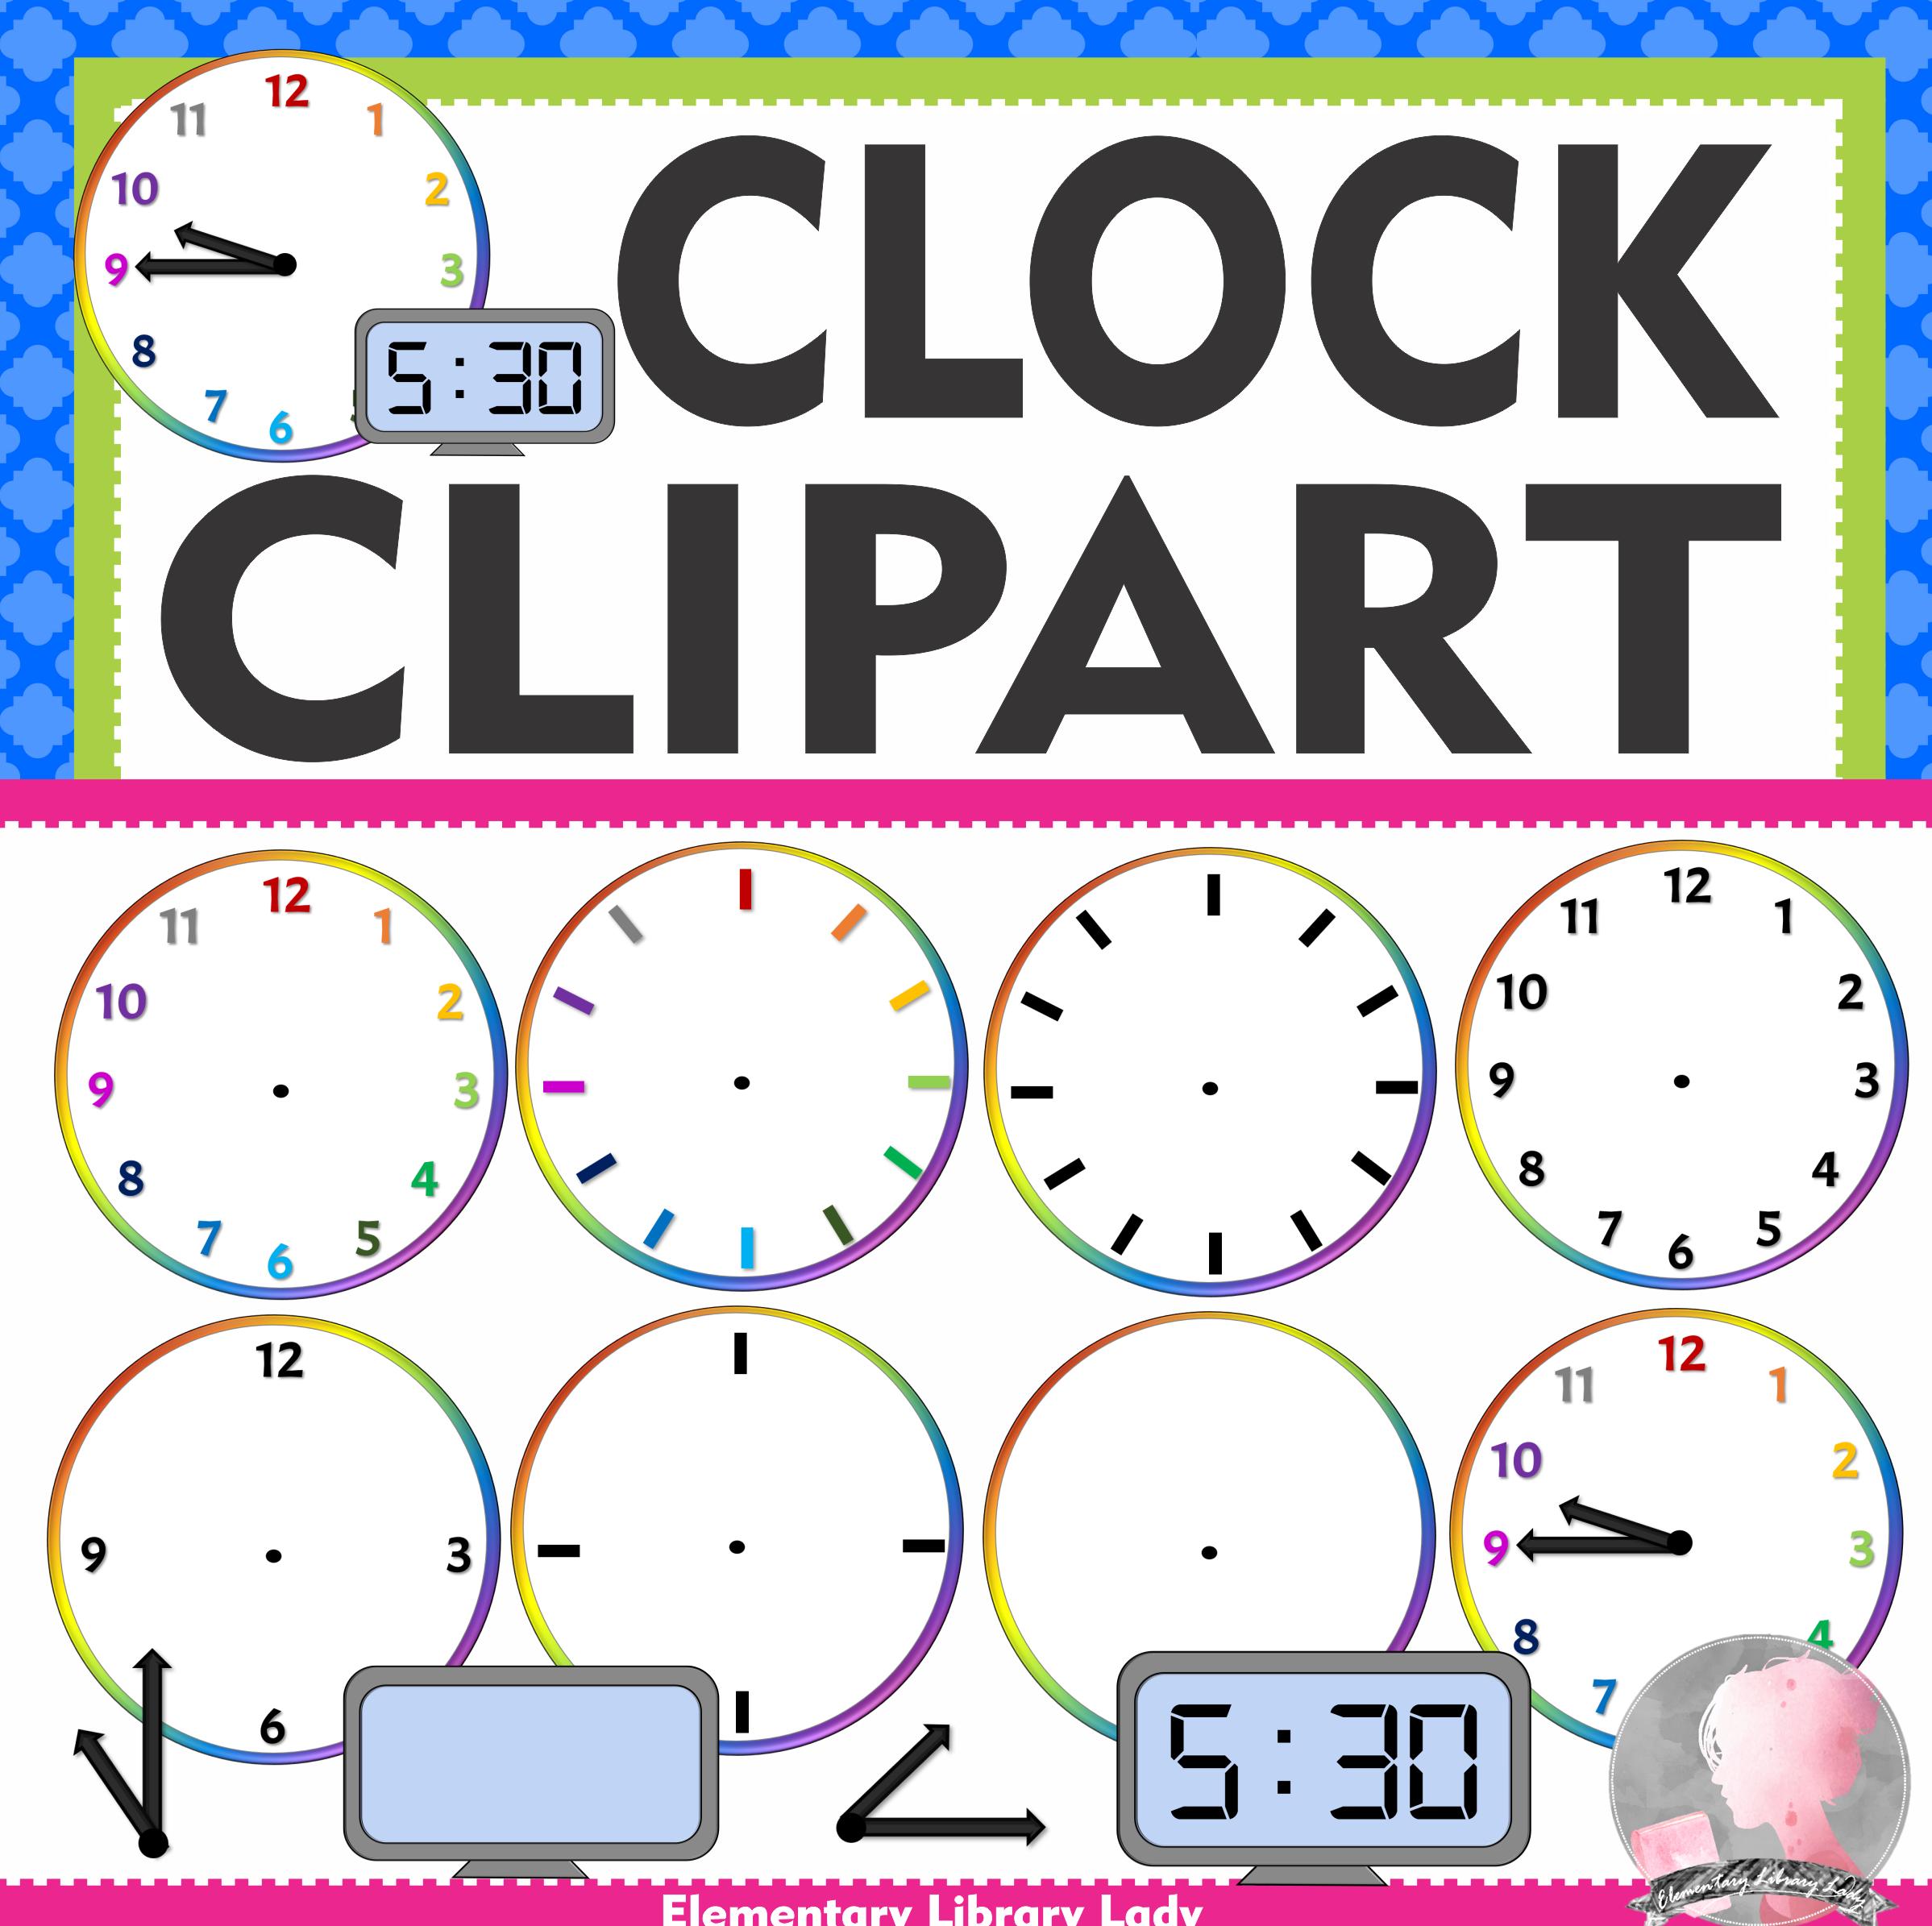 Clock Clipart Analog Digital Clock Parts 00 15 30 45 Personal Commercial Elementary Library Elementary School Teacher Clip Art